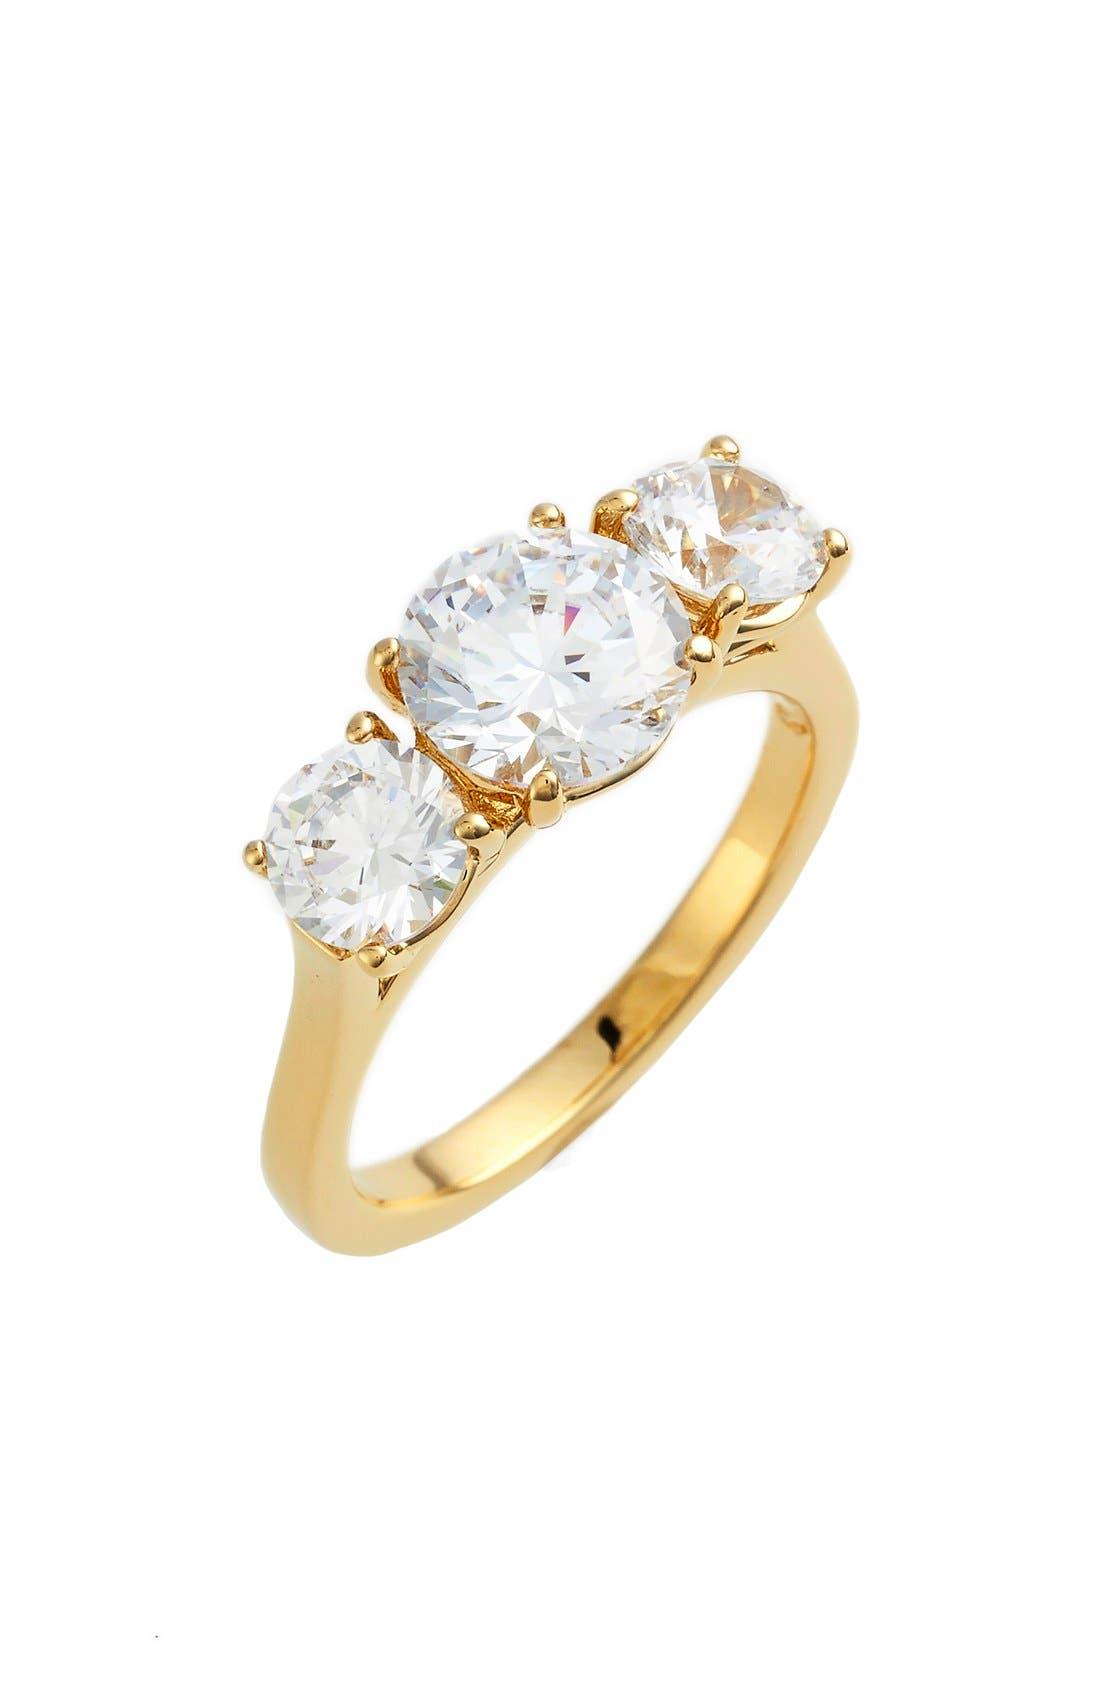 Main Image - Nadri 3-Stone Cubic Zirconia Ring